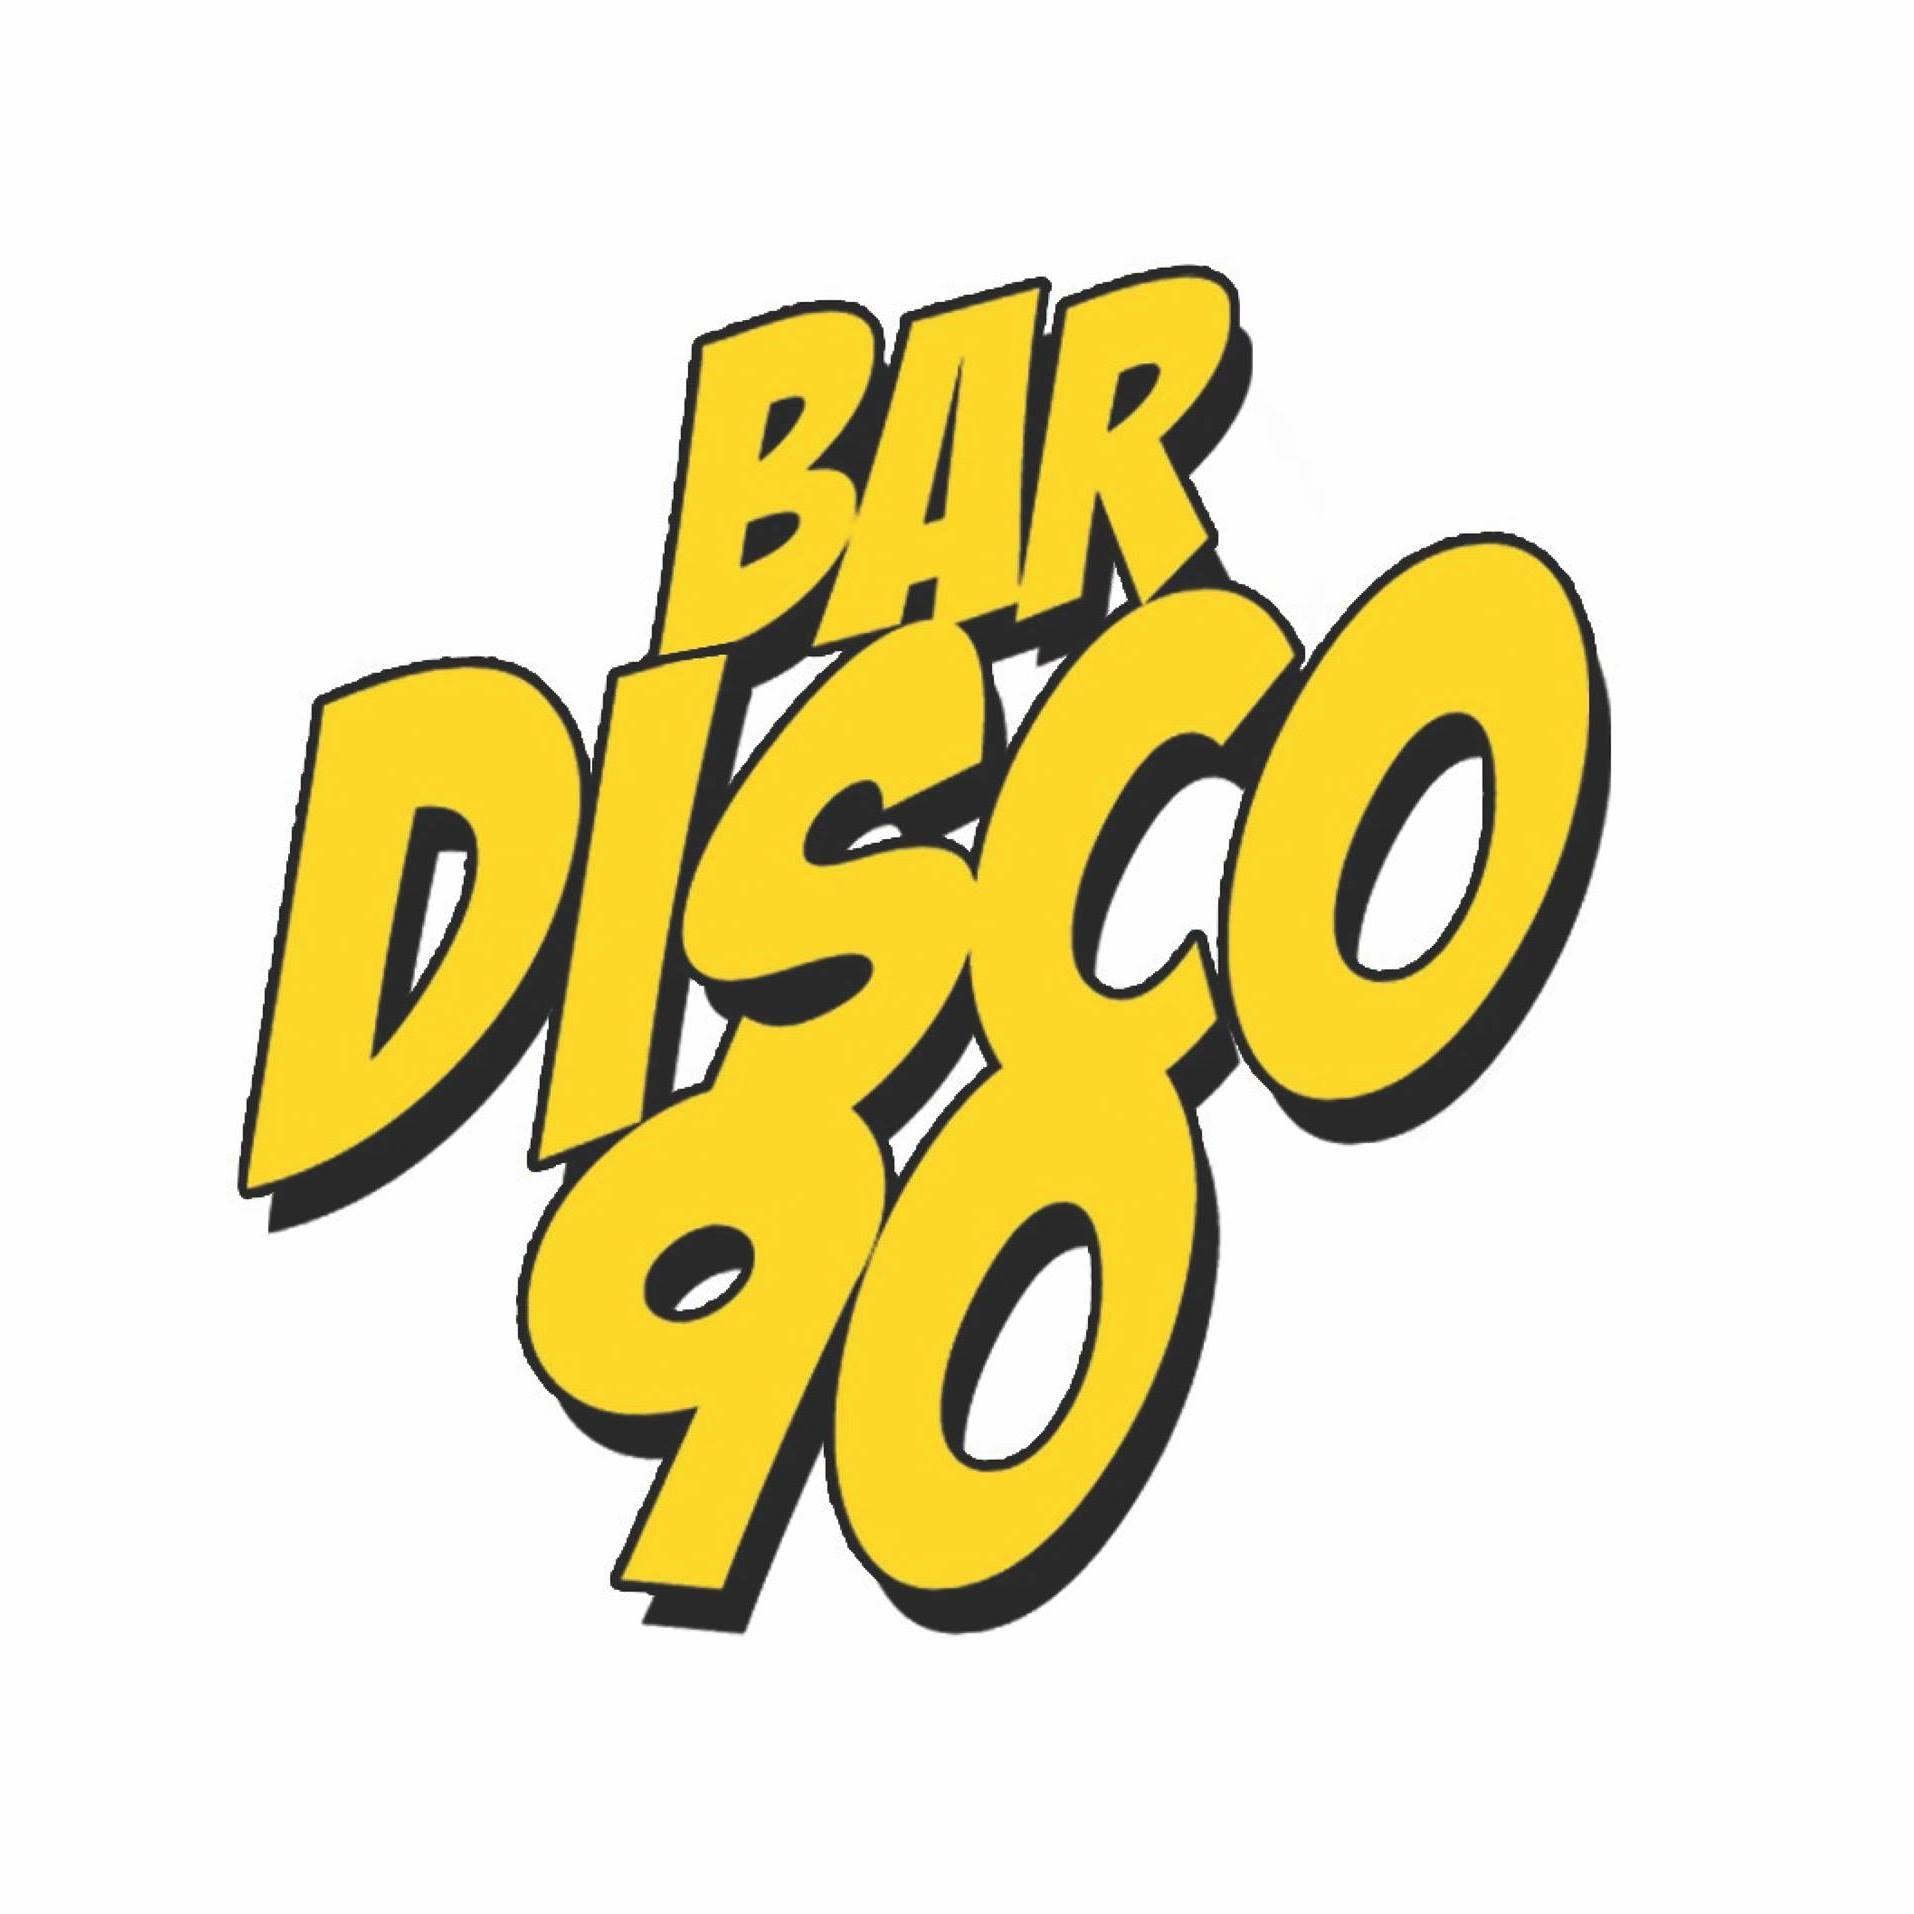 Логотип площадки BAR DISCO 90